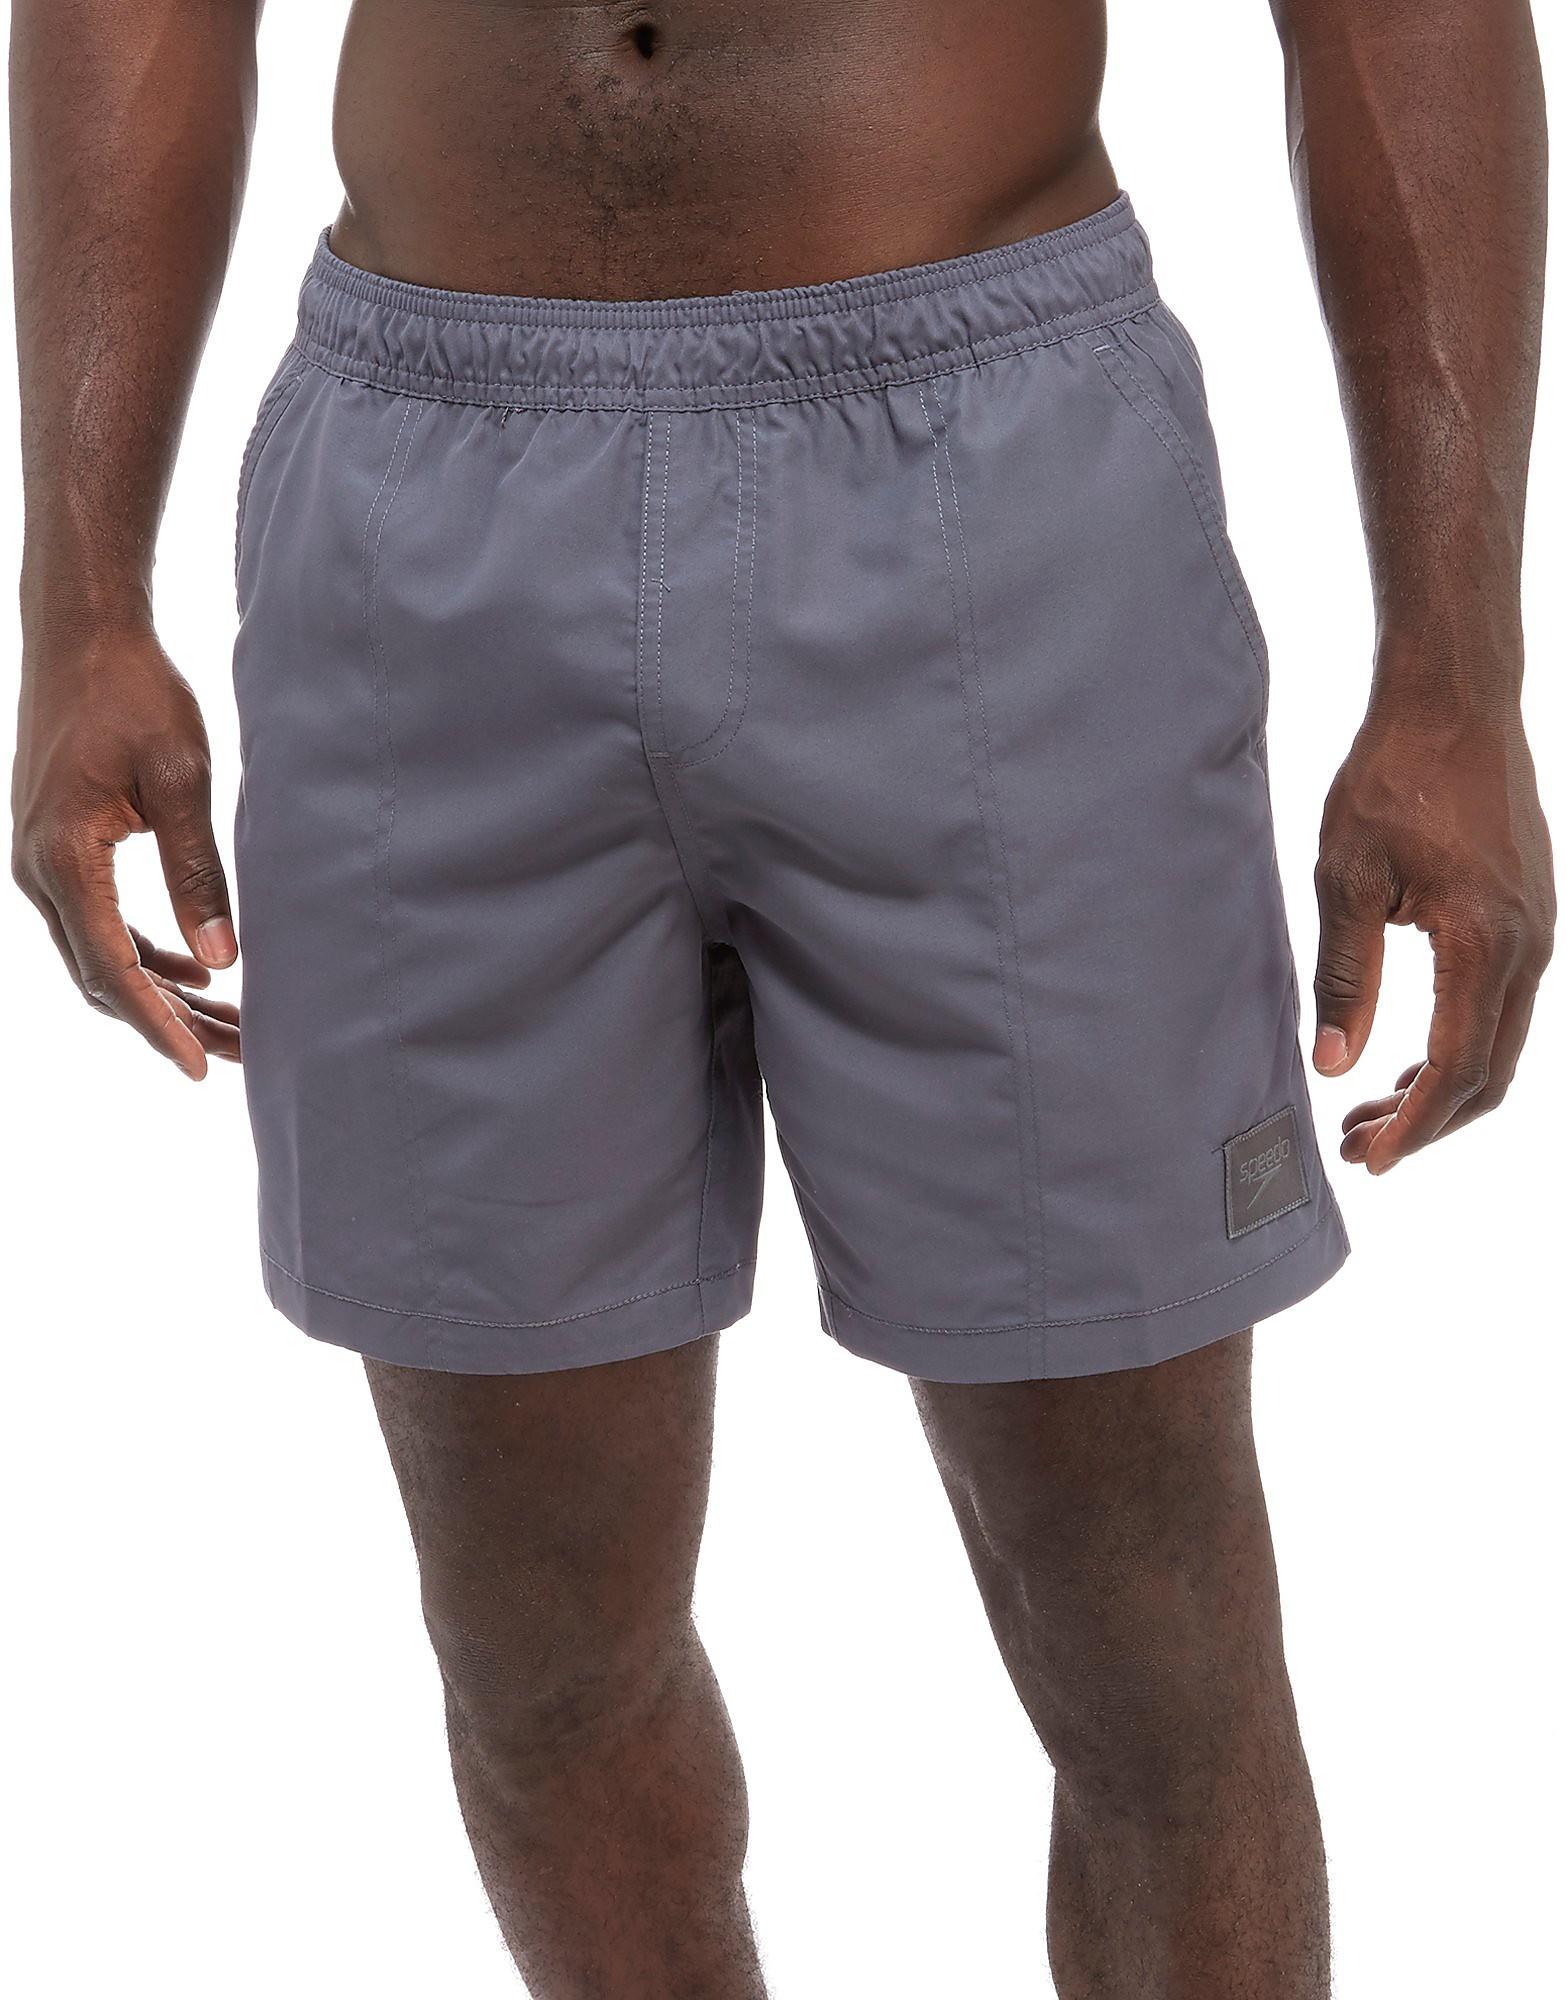 "Speedo Check Trim 16"" Swim Shorts"